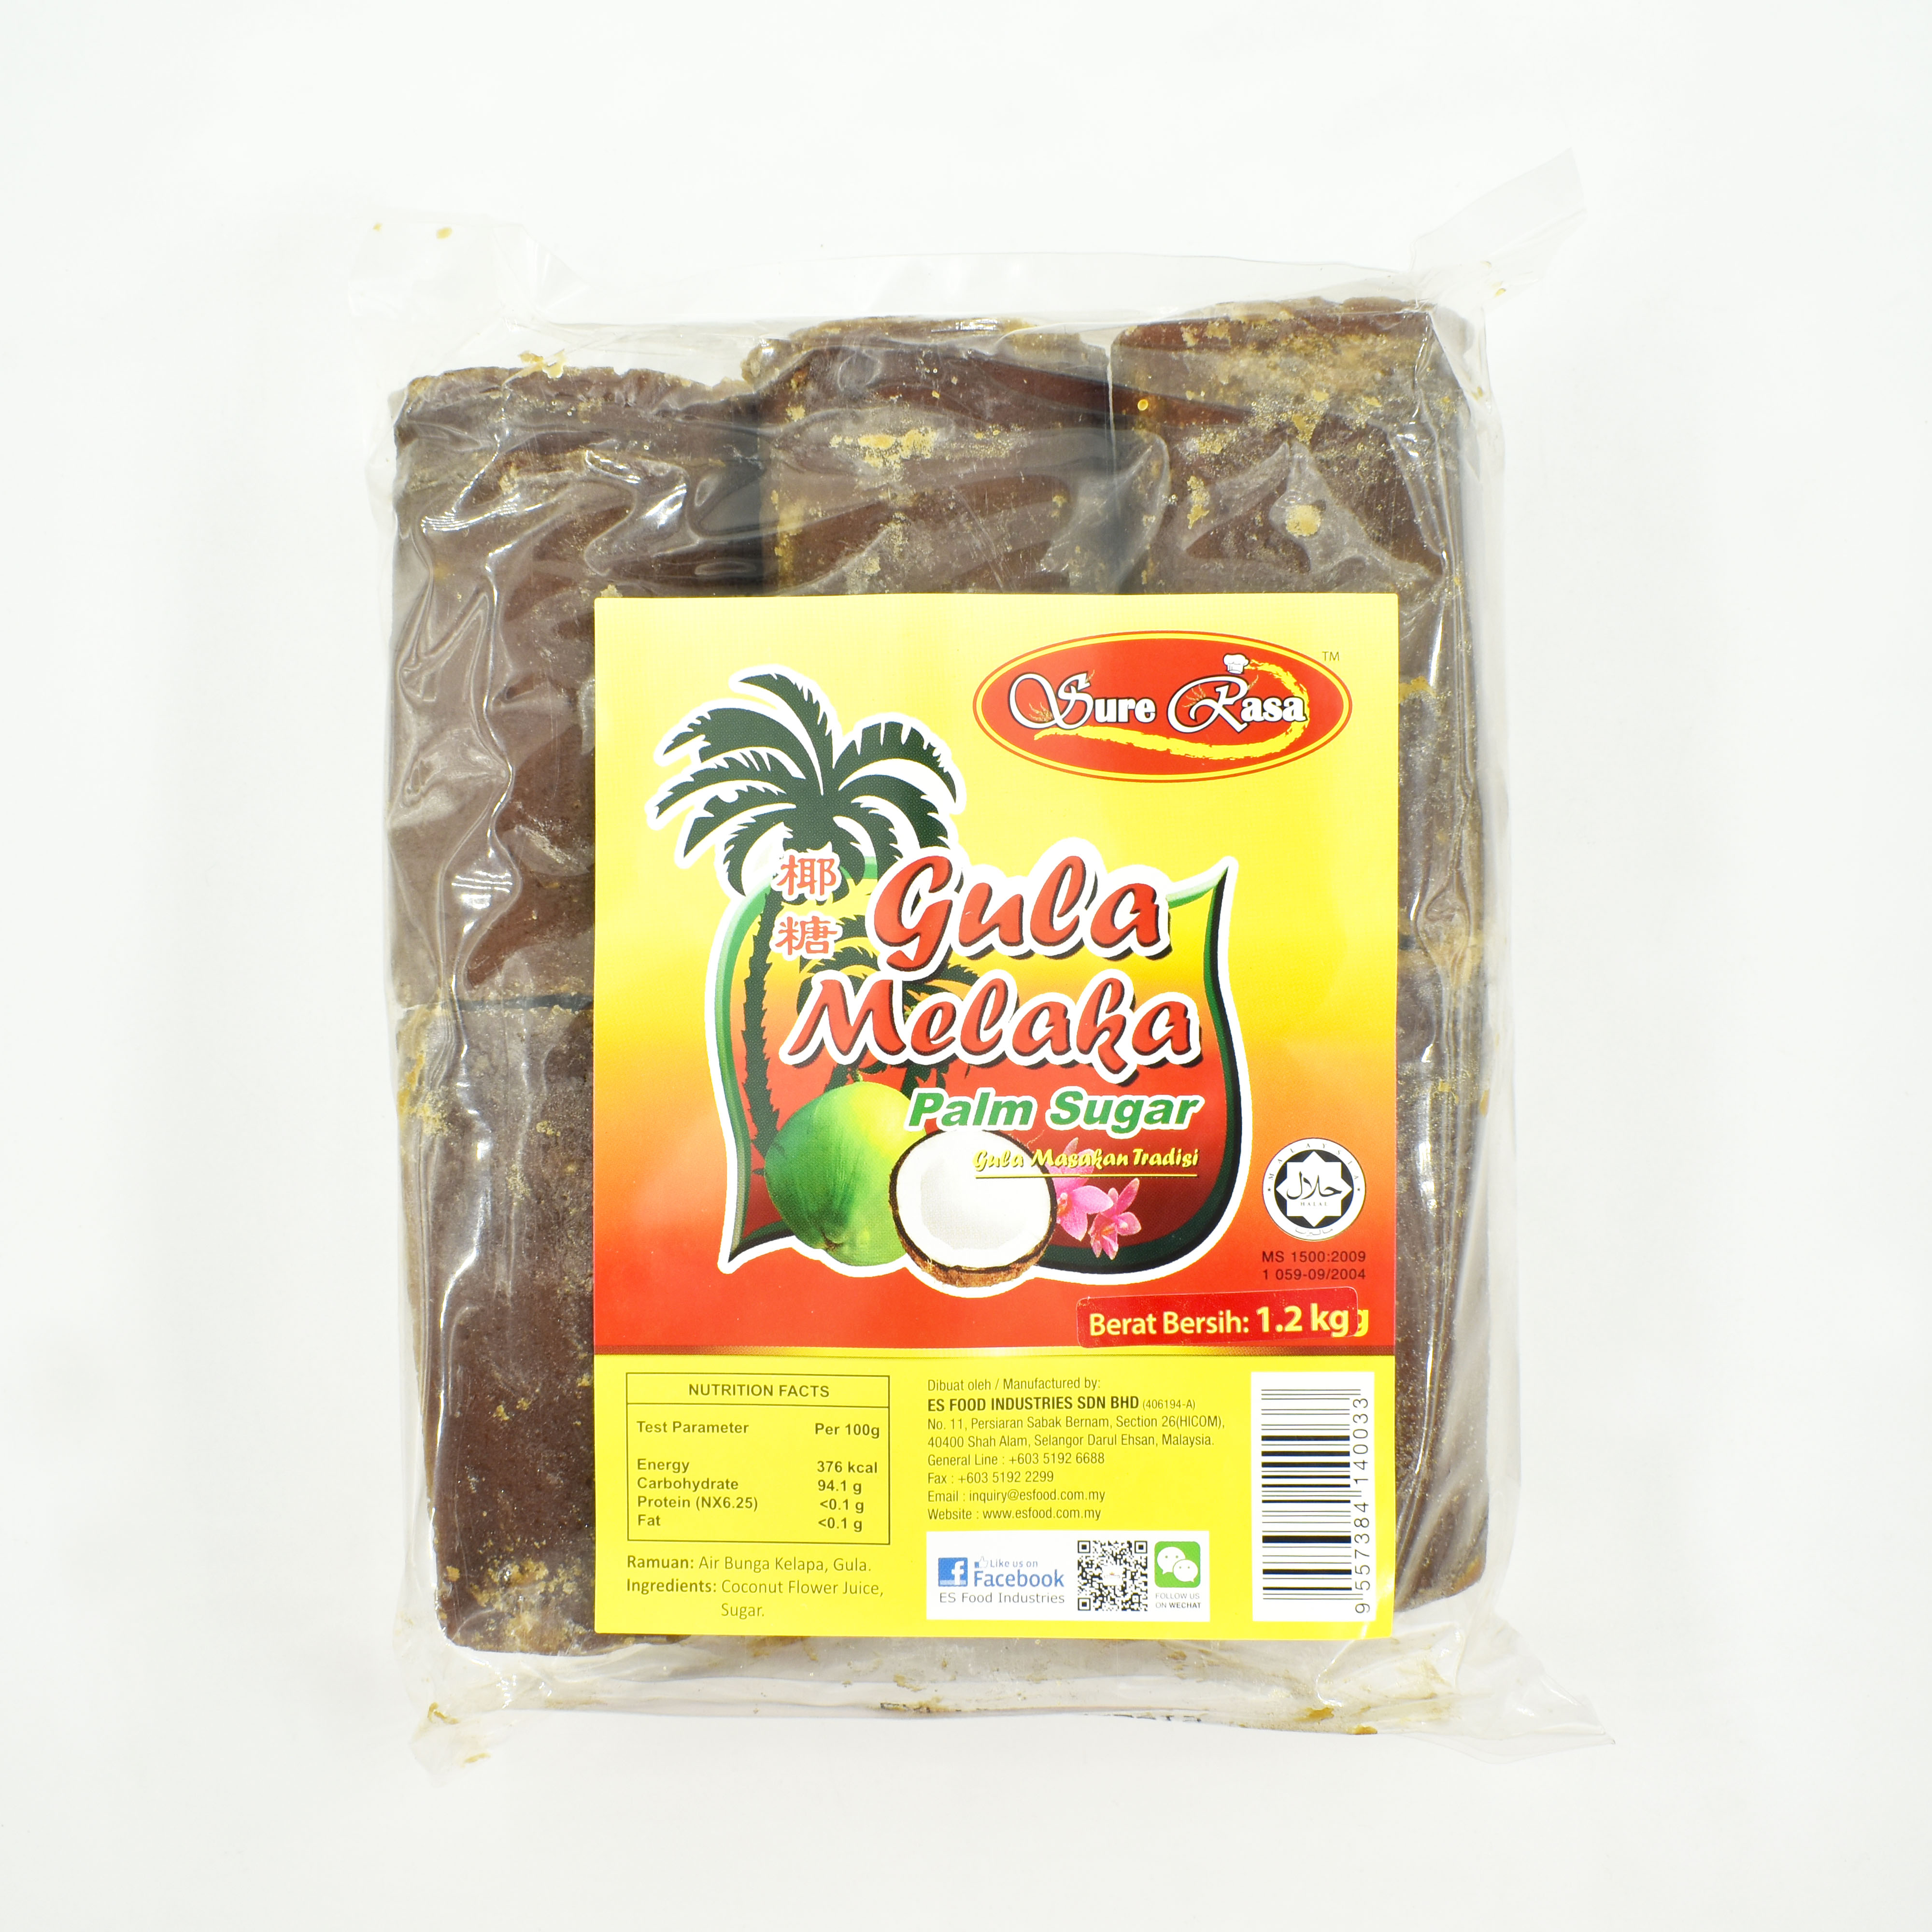 1 2 Kg Malaysia Sure Rasa Gula Melaka Coconut Palm Sugar Sweetener Buy Gula Melaka Coconut Palm Sugar Sweetener Product On Alibaba Com